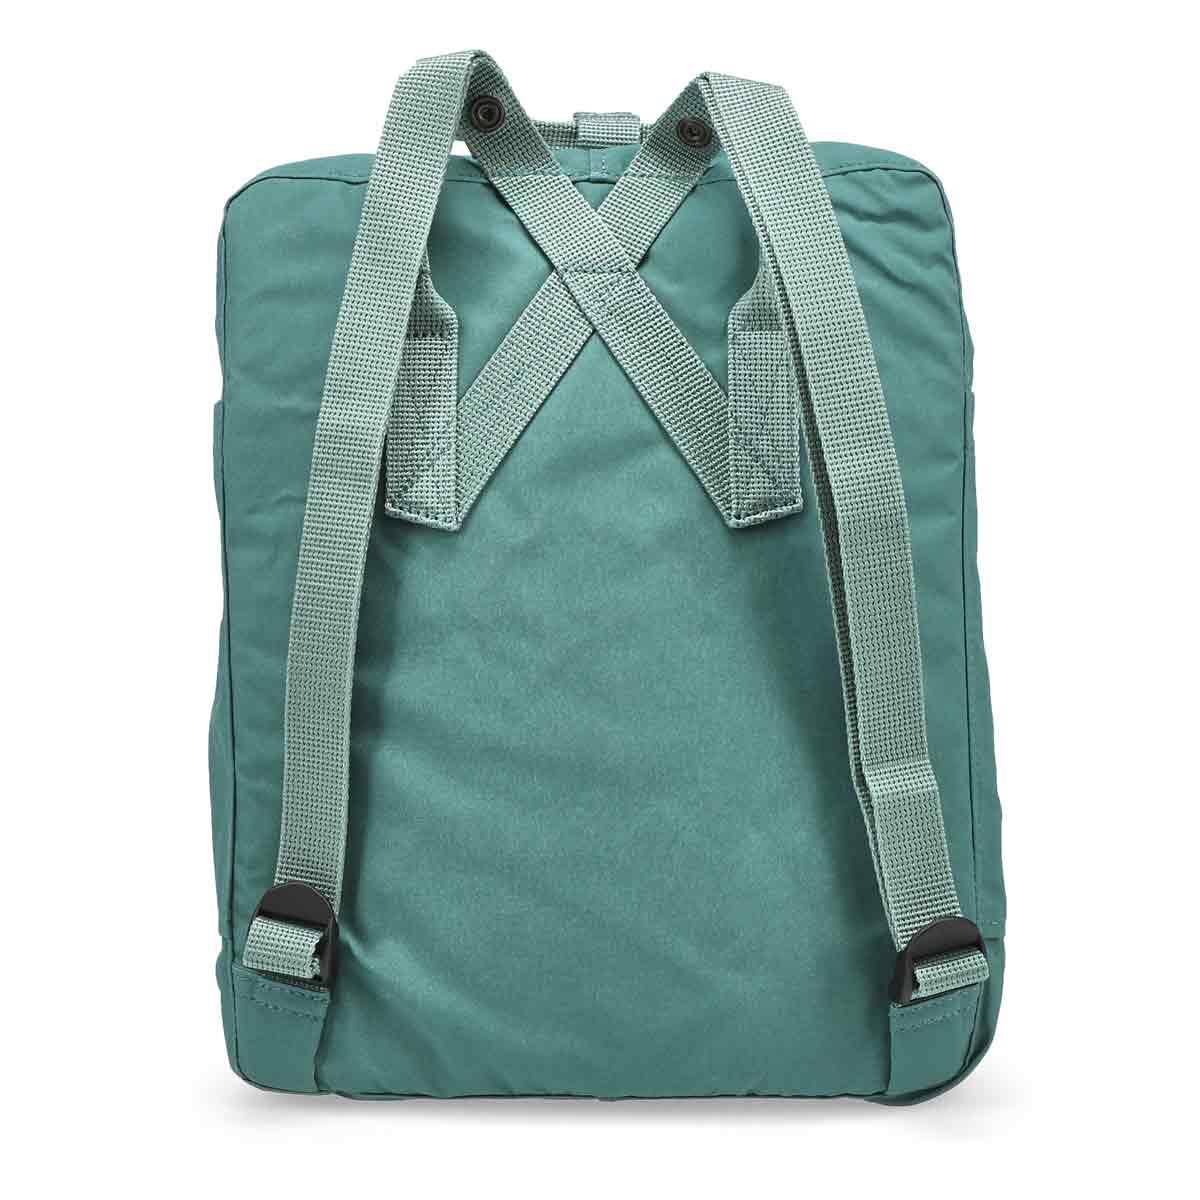 Fjallraven Kanken Backpack - Frost Green